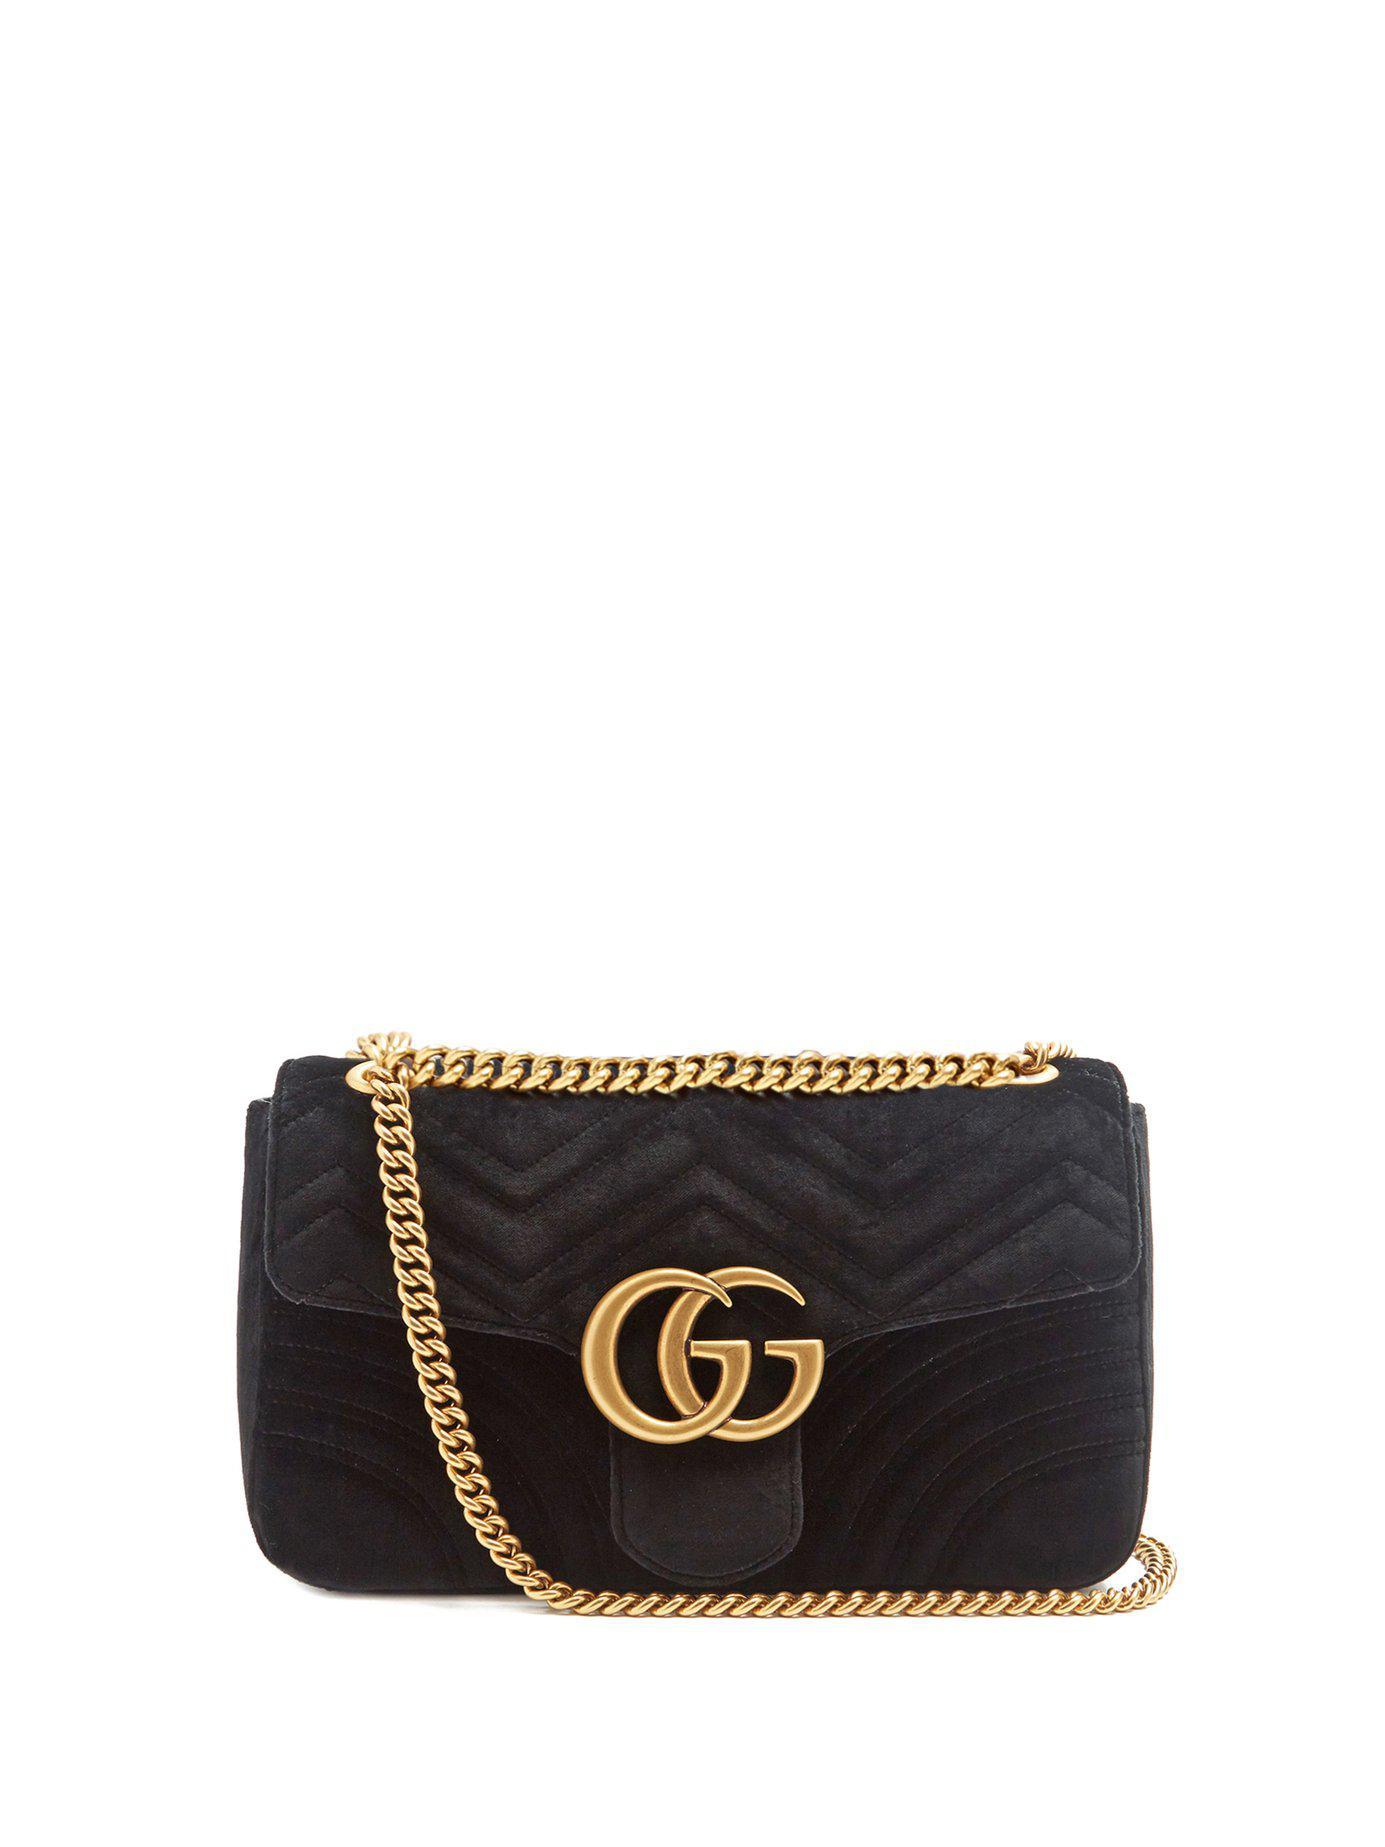 71035cf962fb Gucci Gg Marmont Mini Velvet Quilted Shoulder Bag in Black - Lyst